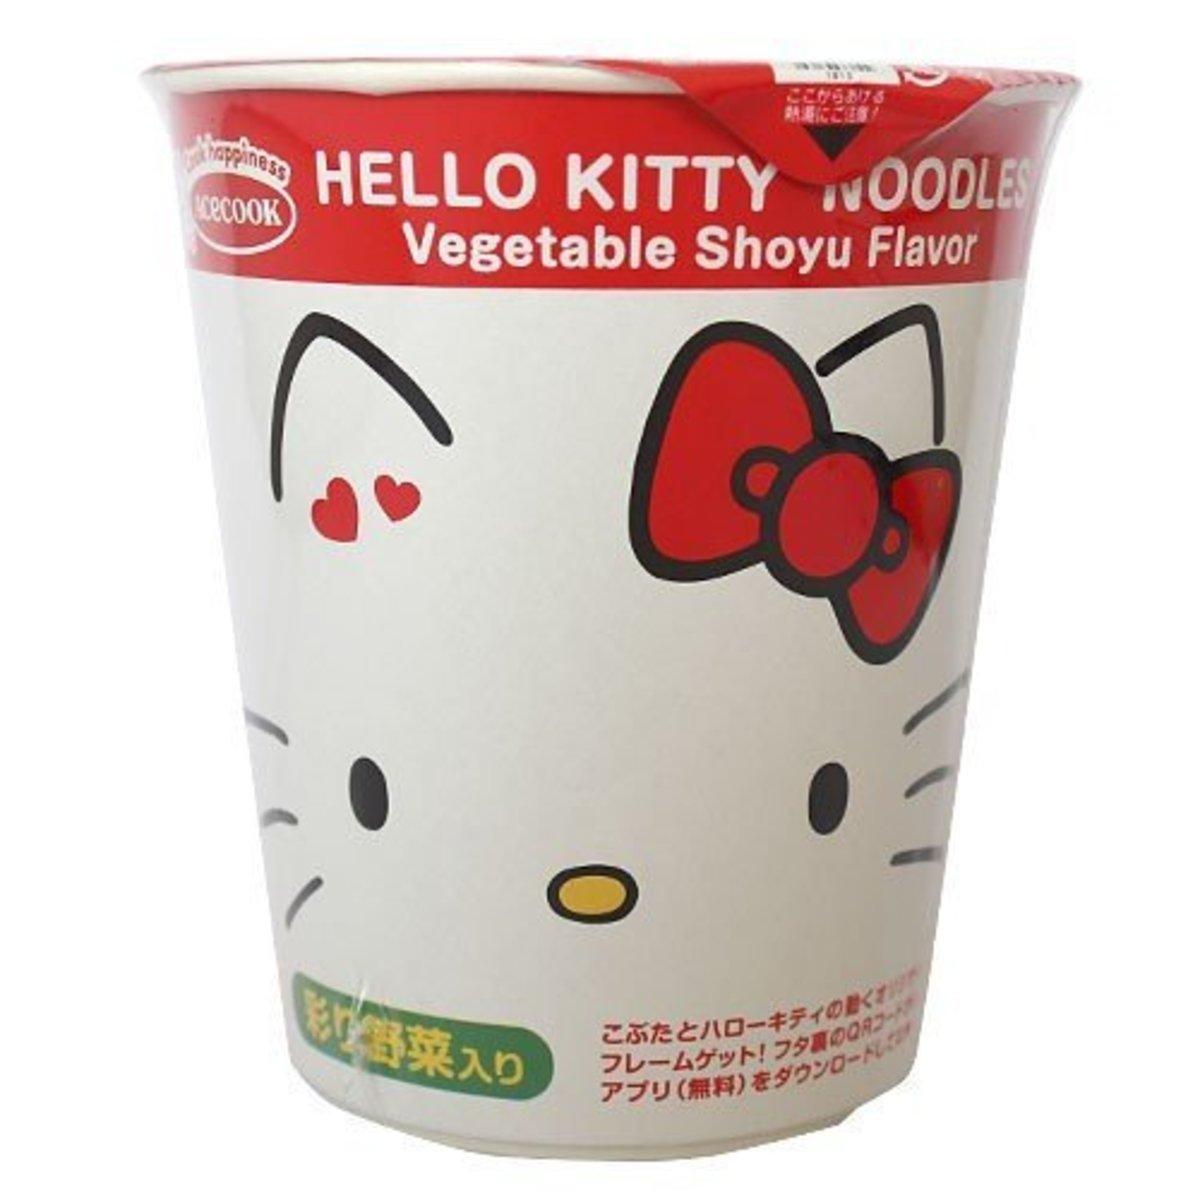 (糽色) 日本ACECOOK Hello Kitty 蔬菜醬油味杯麵 x 1個